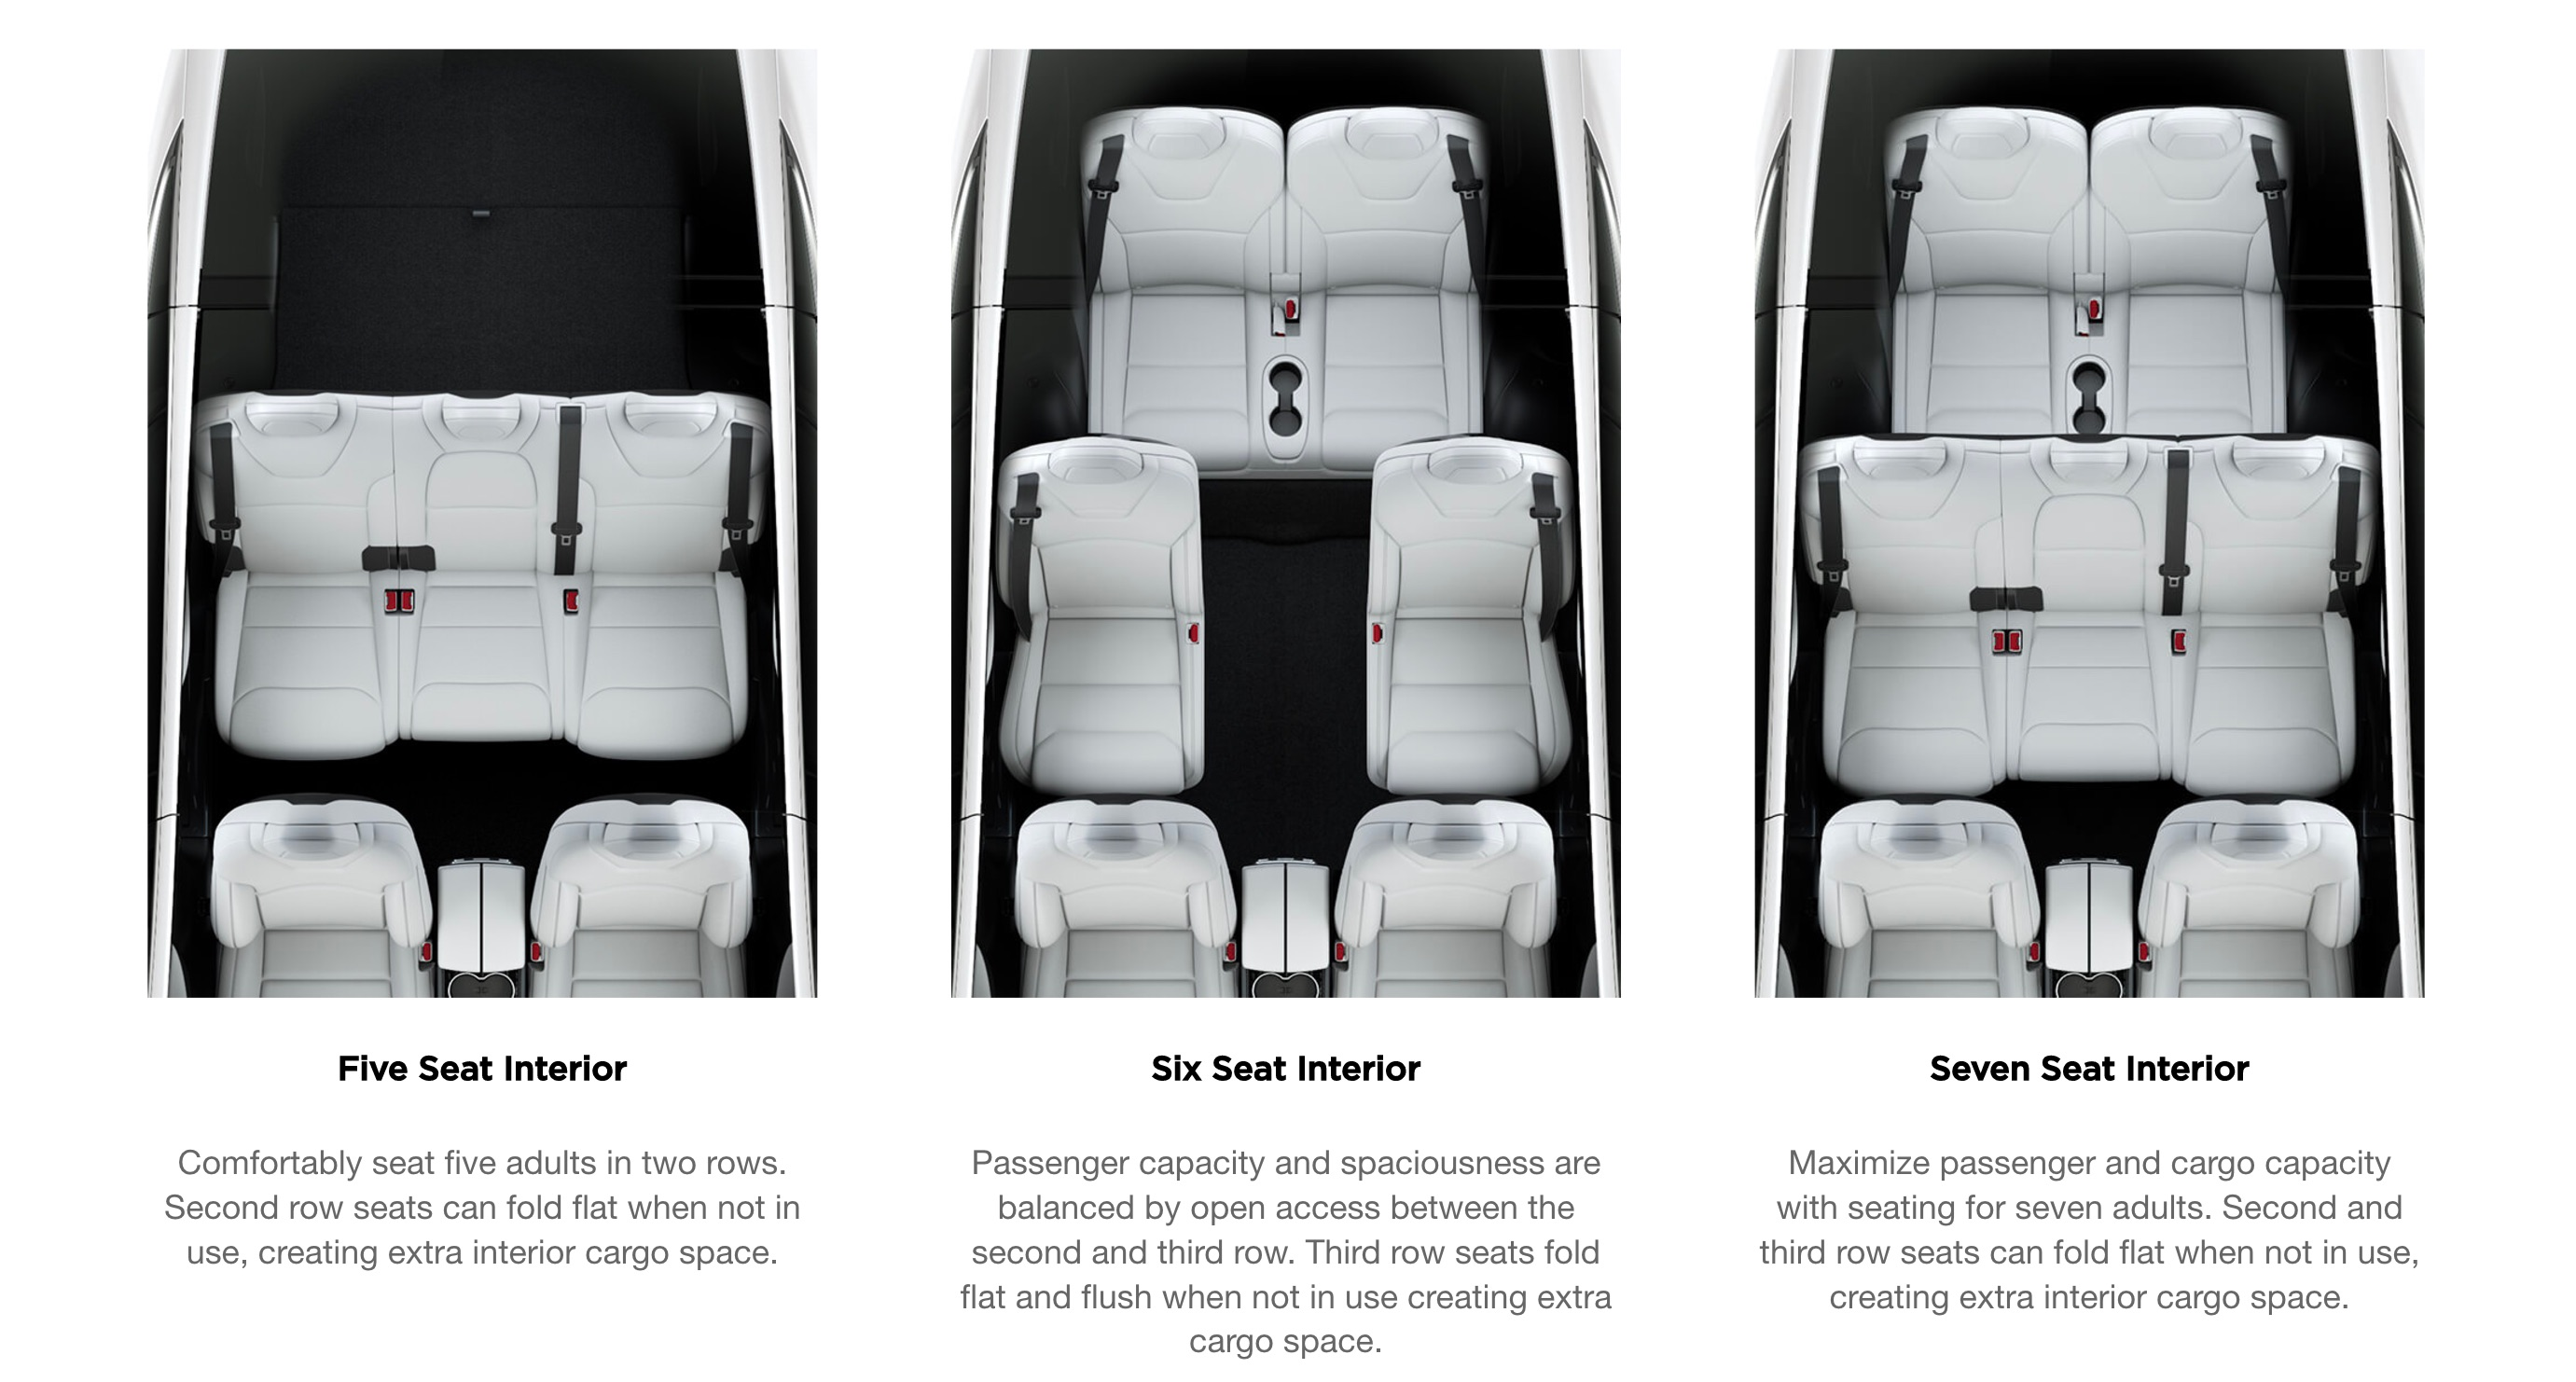 Tesla Model X In 7 Seat Configuration Finally Gets Fold Flat 2nd Row Seats Video